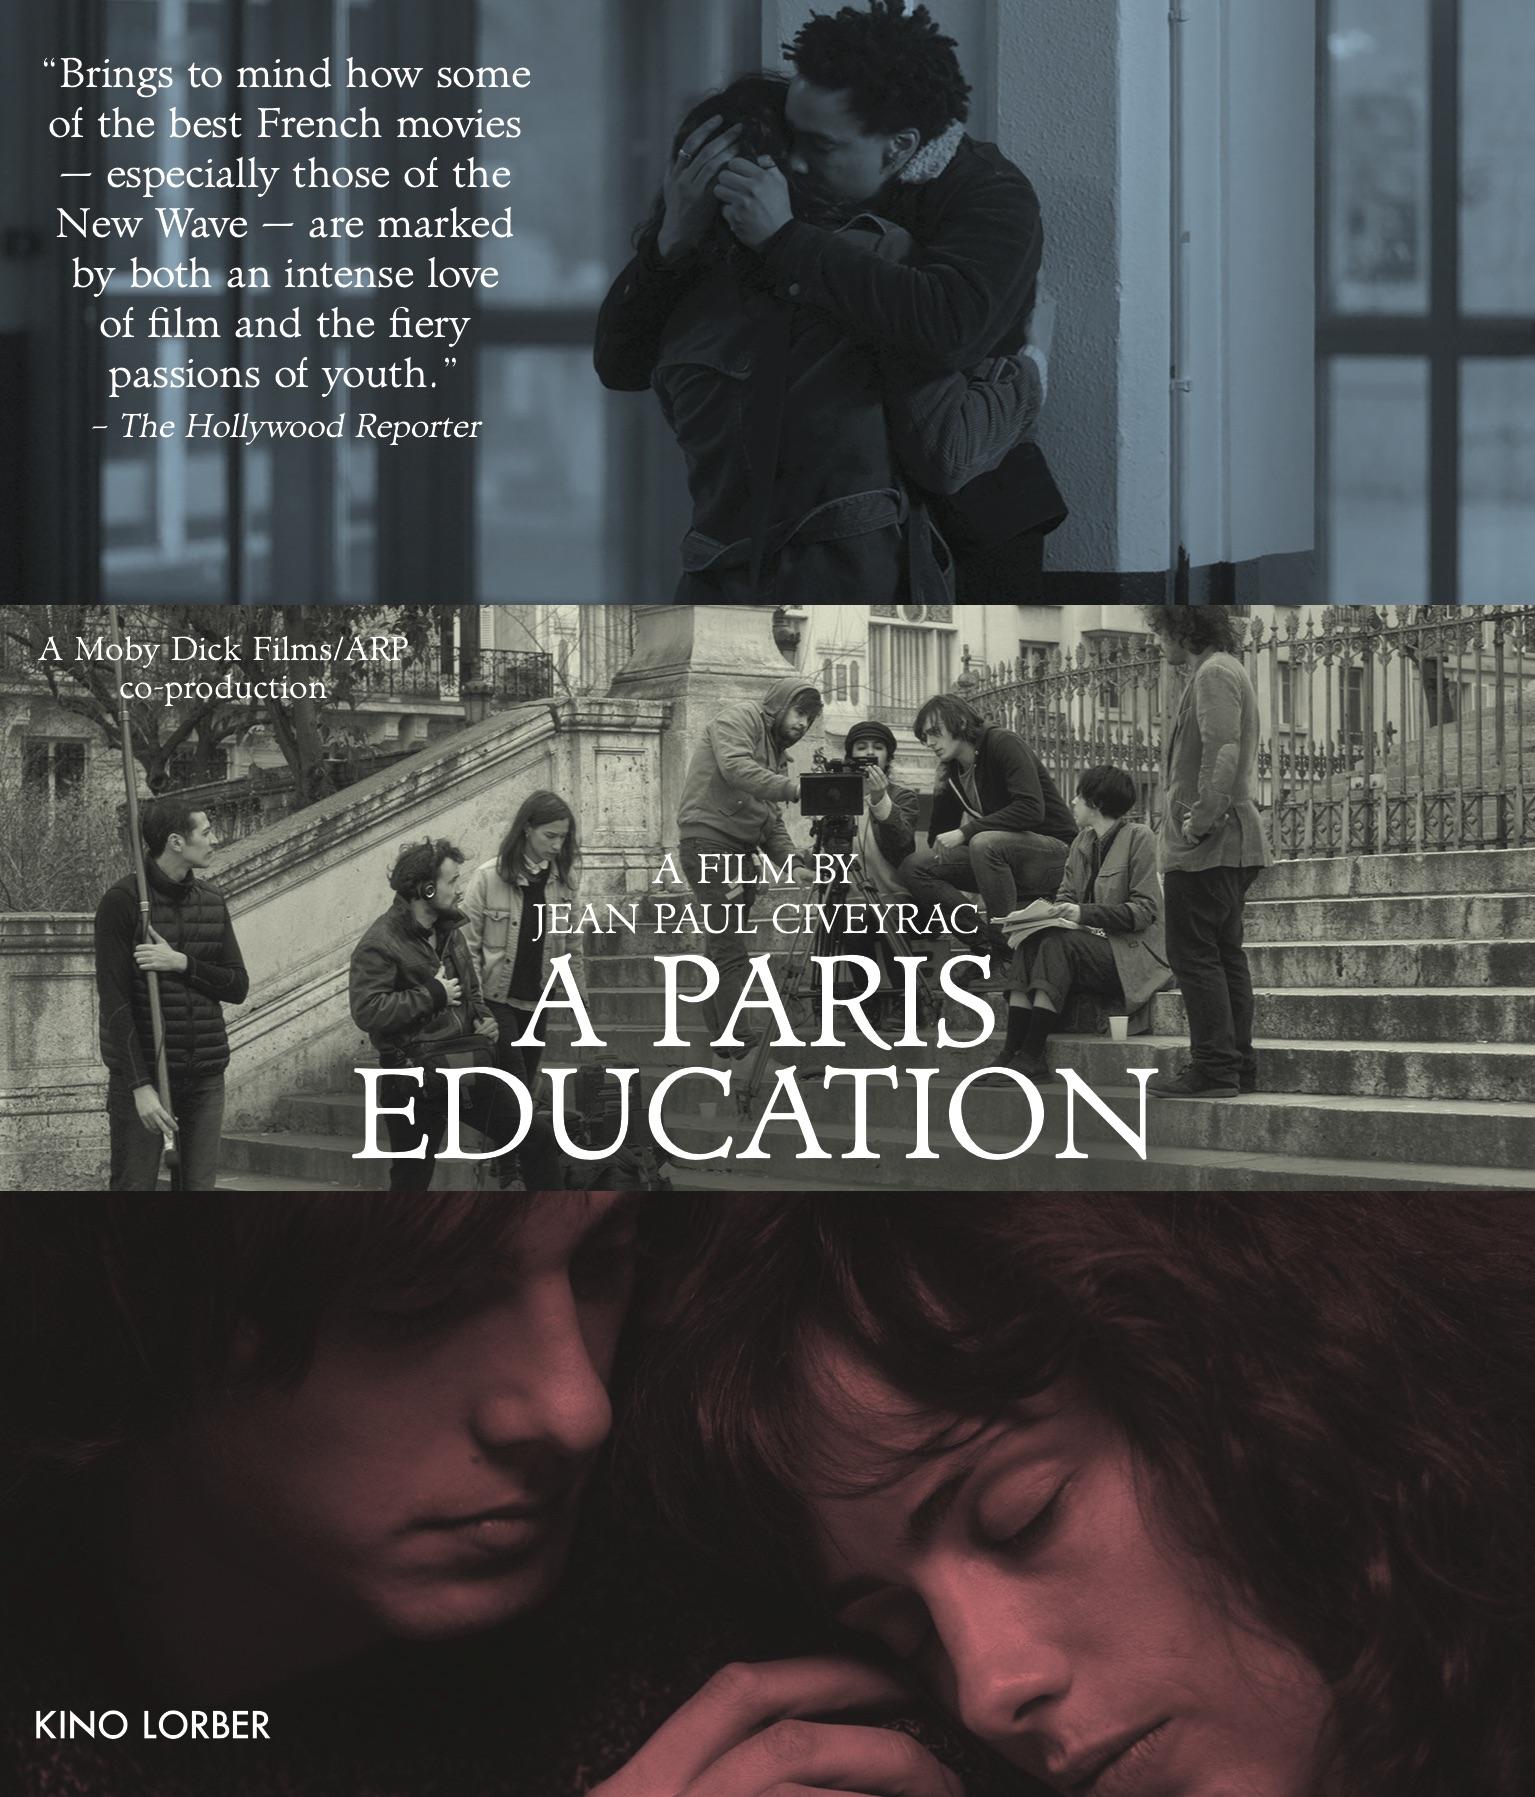 A Paris Education (Blu-ray) - Kino Lorber Home Video